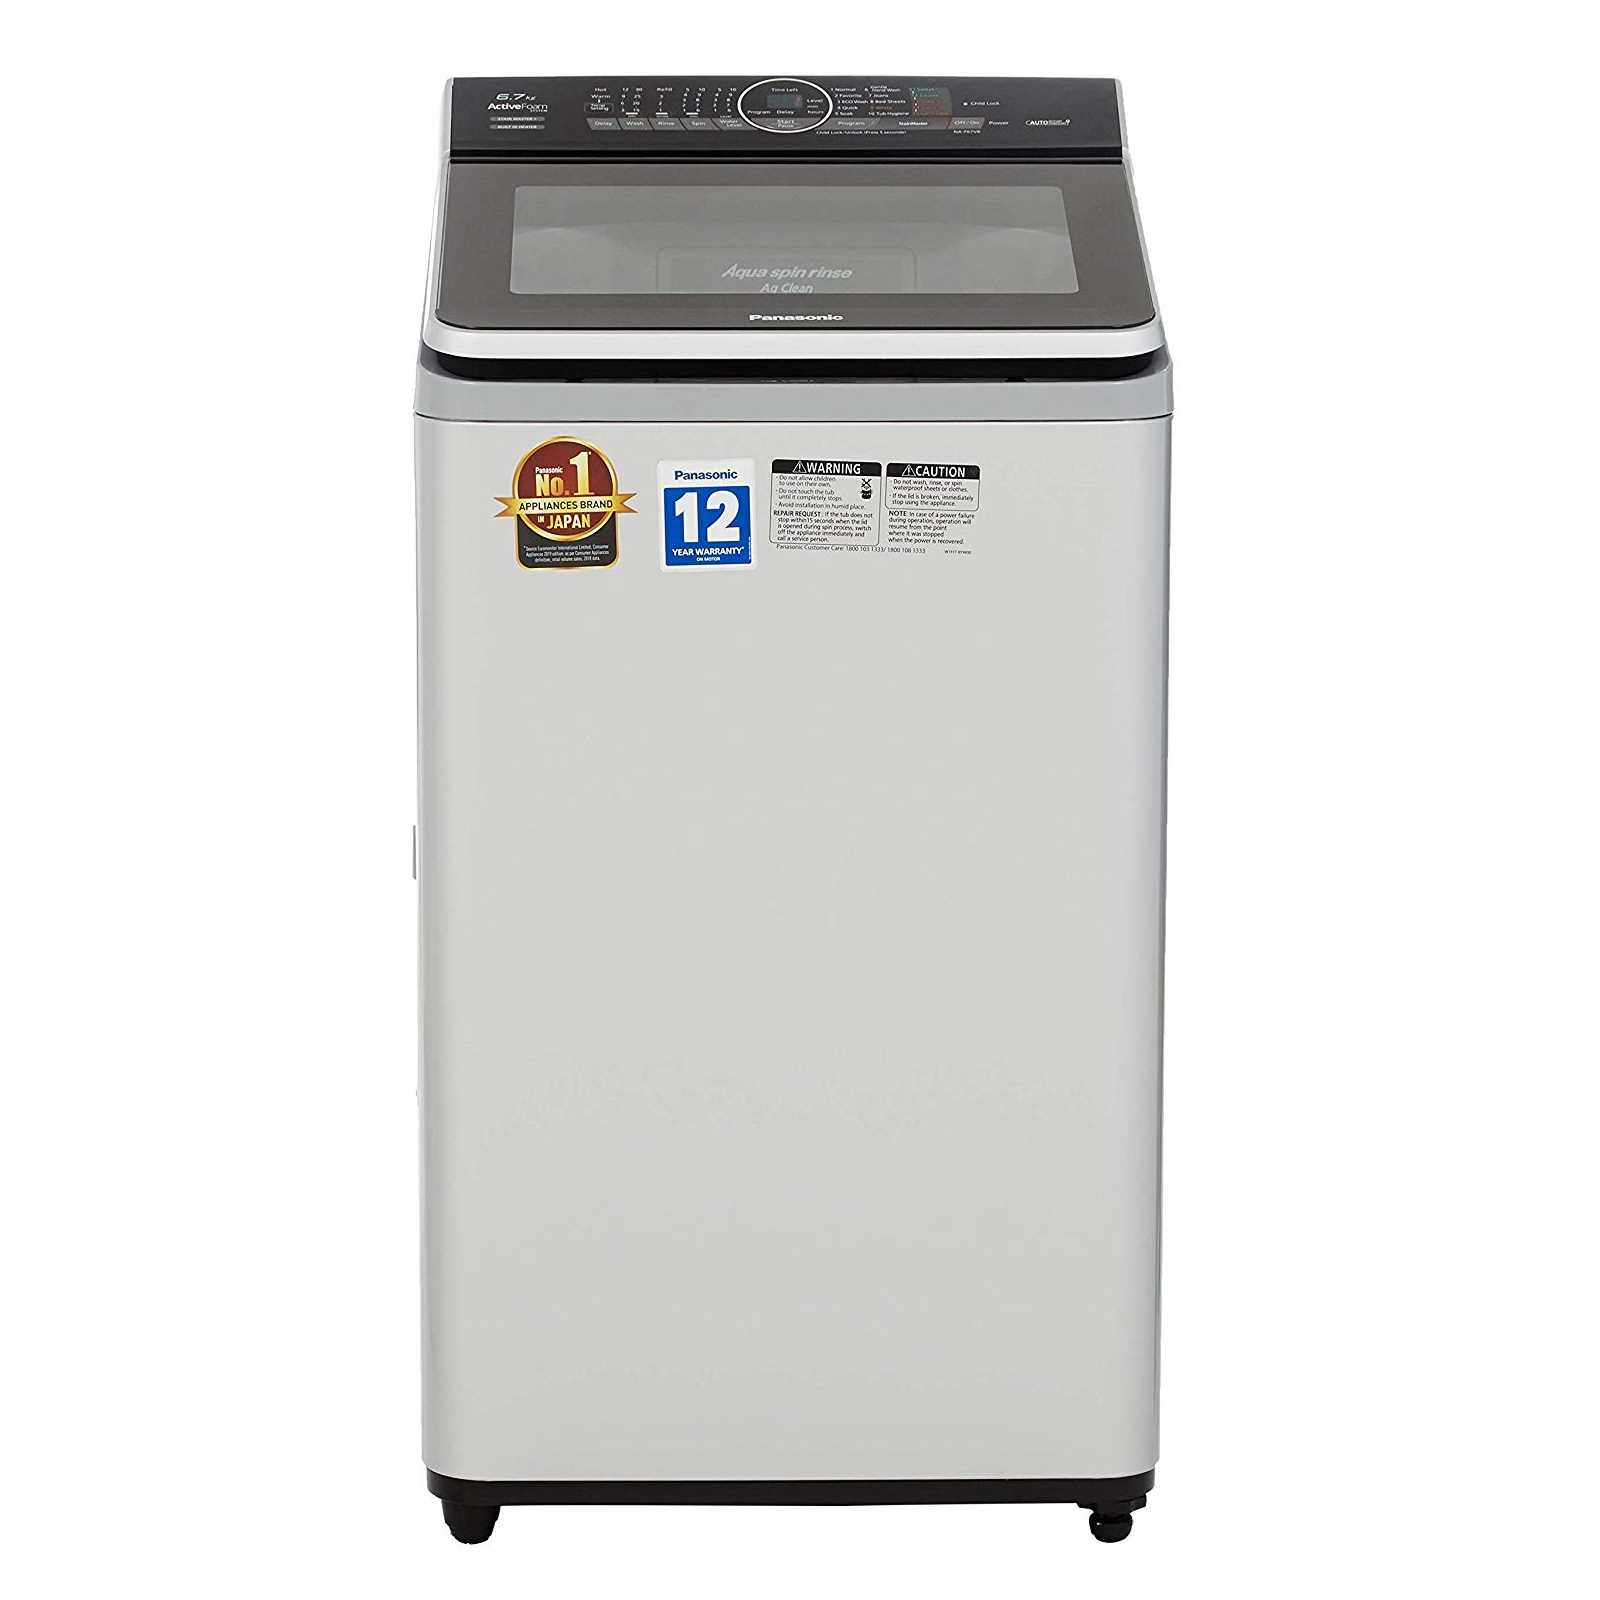 Panasonic NA F67V8 6.7 Kg Fully Automatic Top Loading Washing Machine